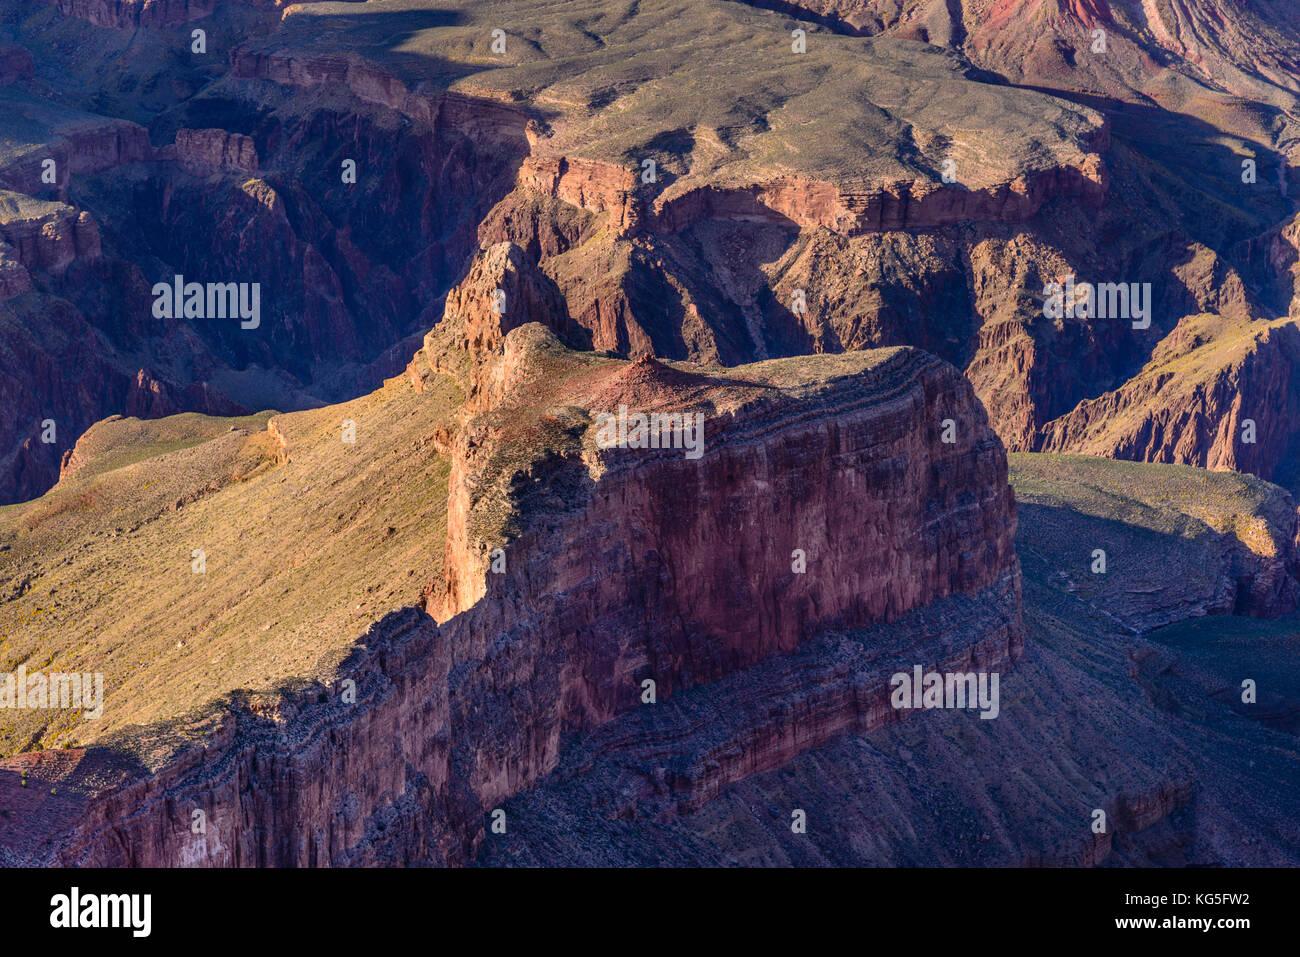 The USA, Arizona, Grand canyon National Park, South Rim, Hopi Point - Stock Image